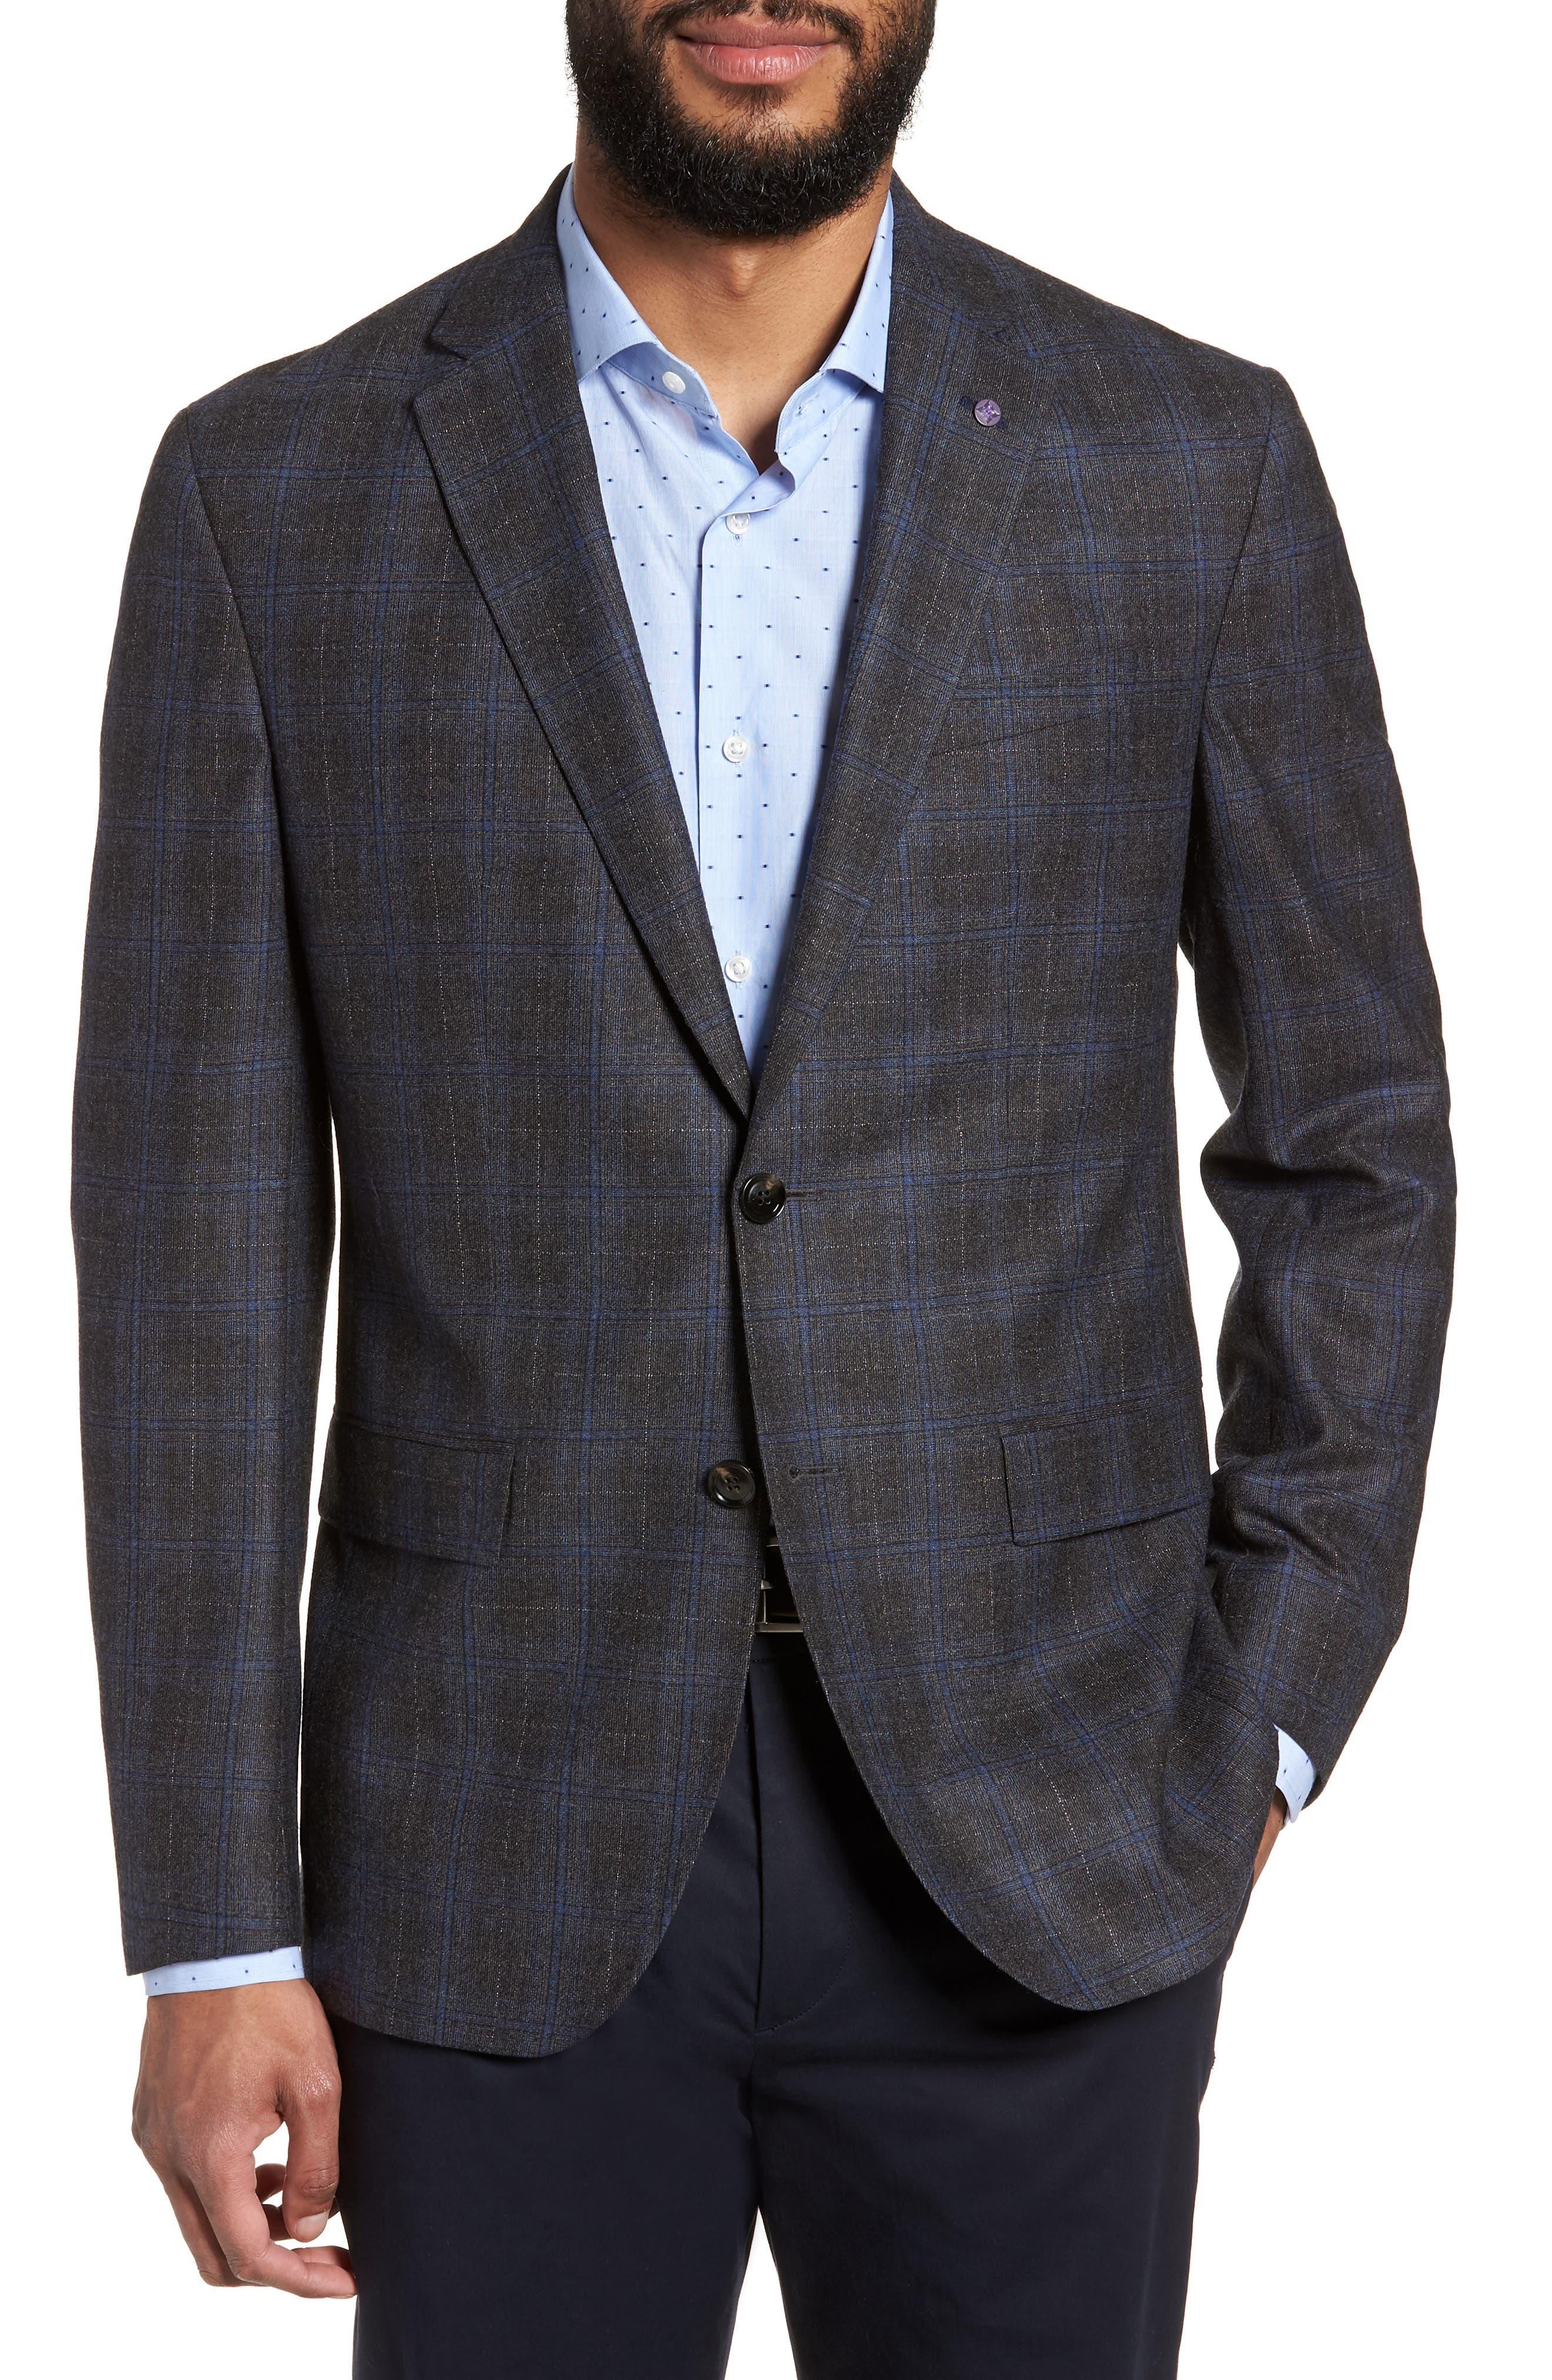 Konan Trim Fit Plaid Wool Sport Coat,                             Main thumbnail 1, color,                             020